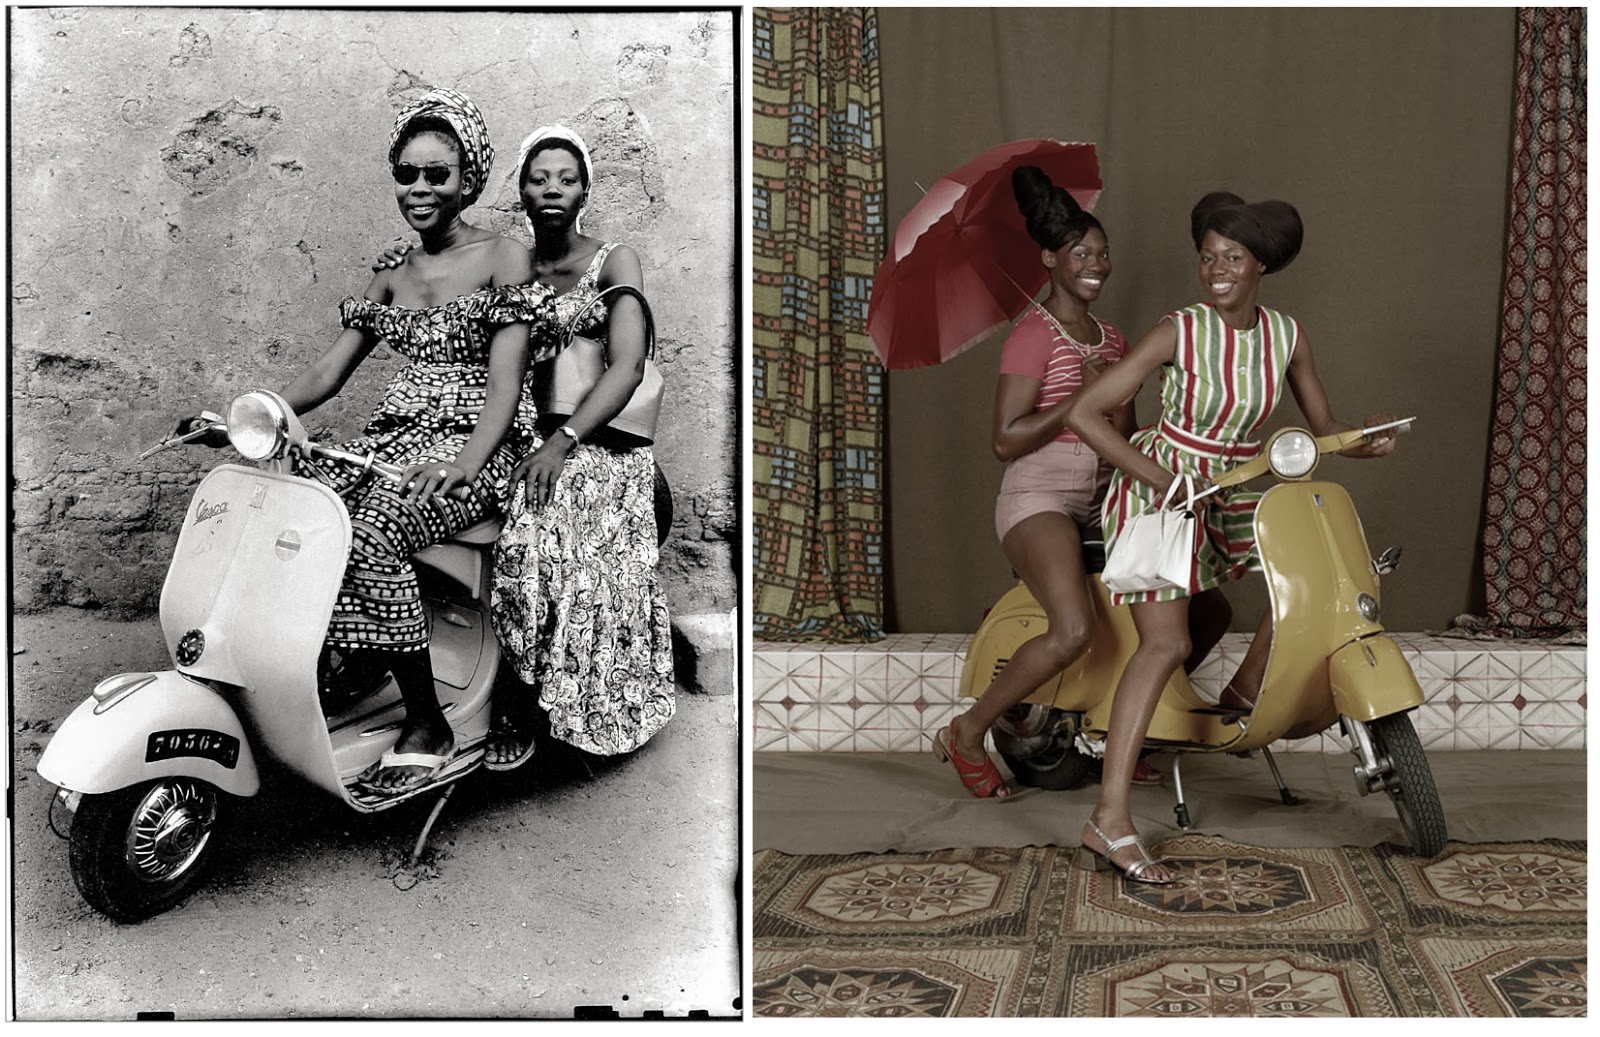 L'eco della fotografia africana